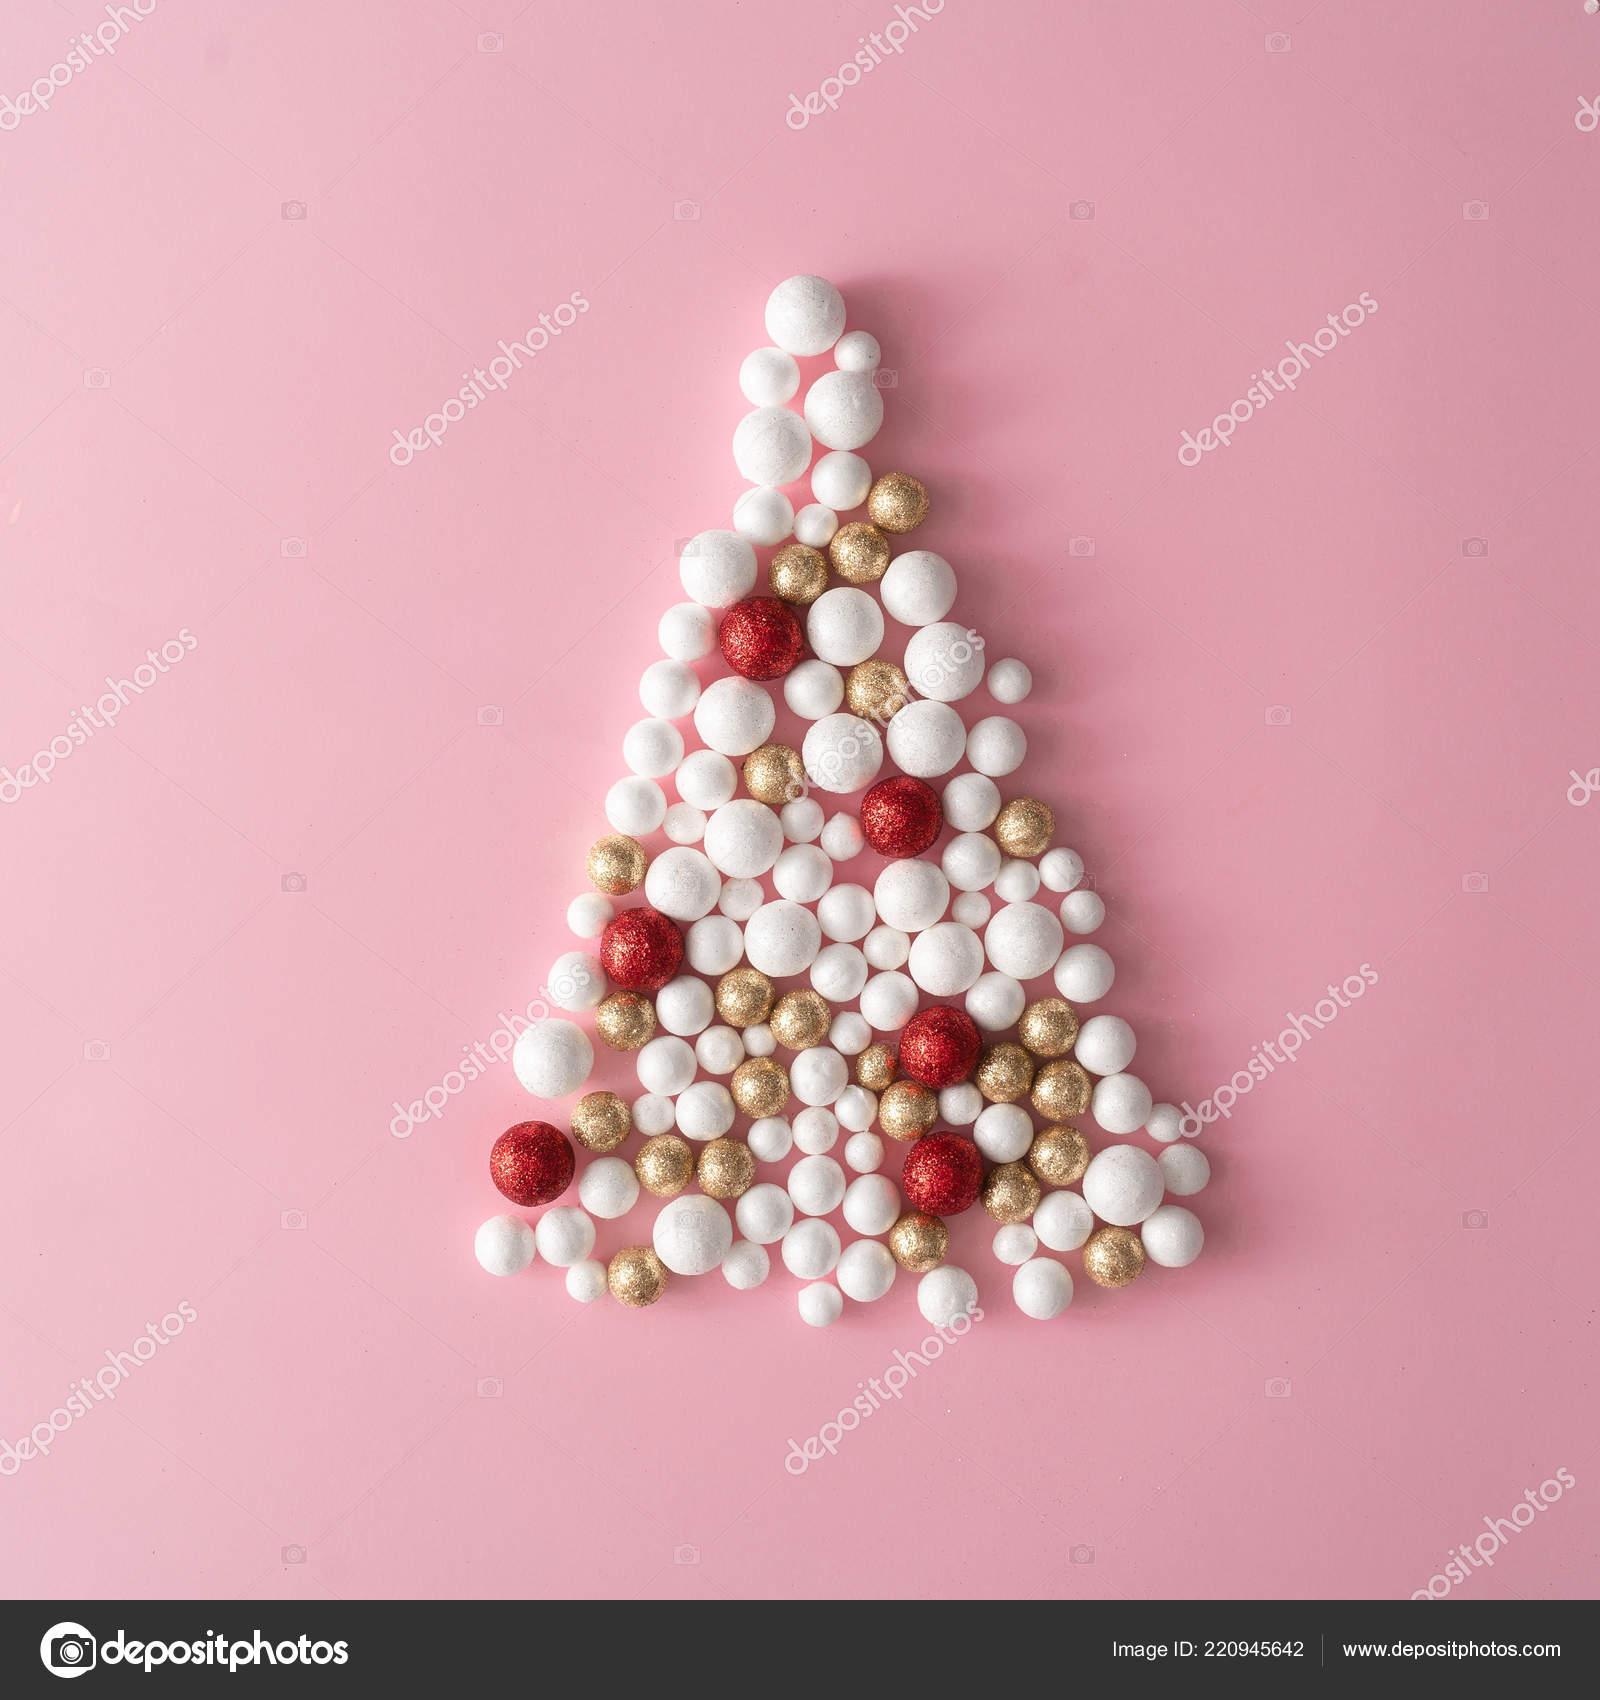 Christmas Tree Made Gold Red White Glitter Ball Decorations Pink Stock Photo C Zamurovic 220945642